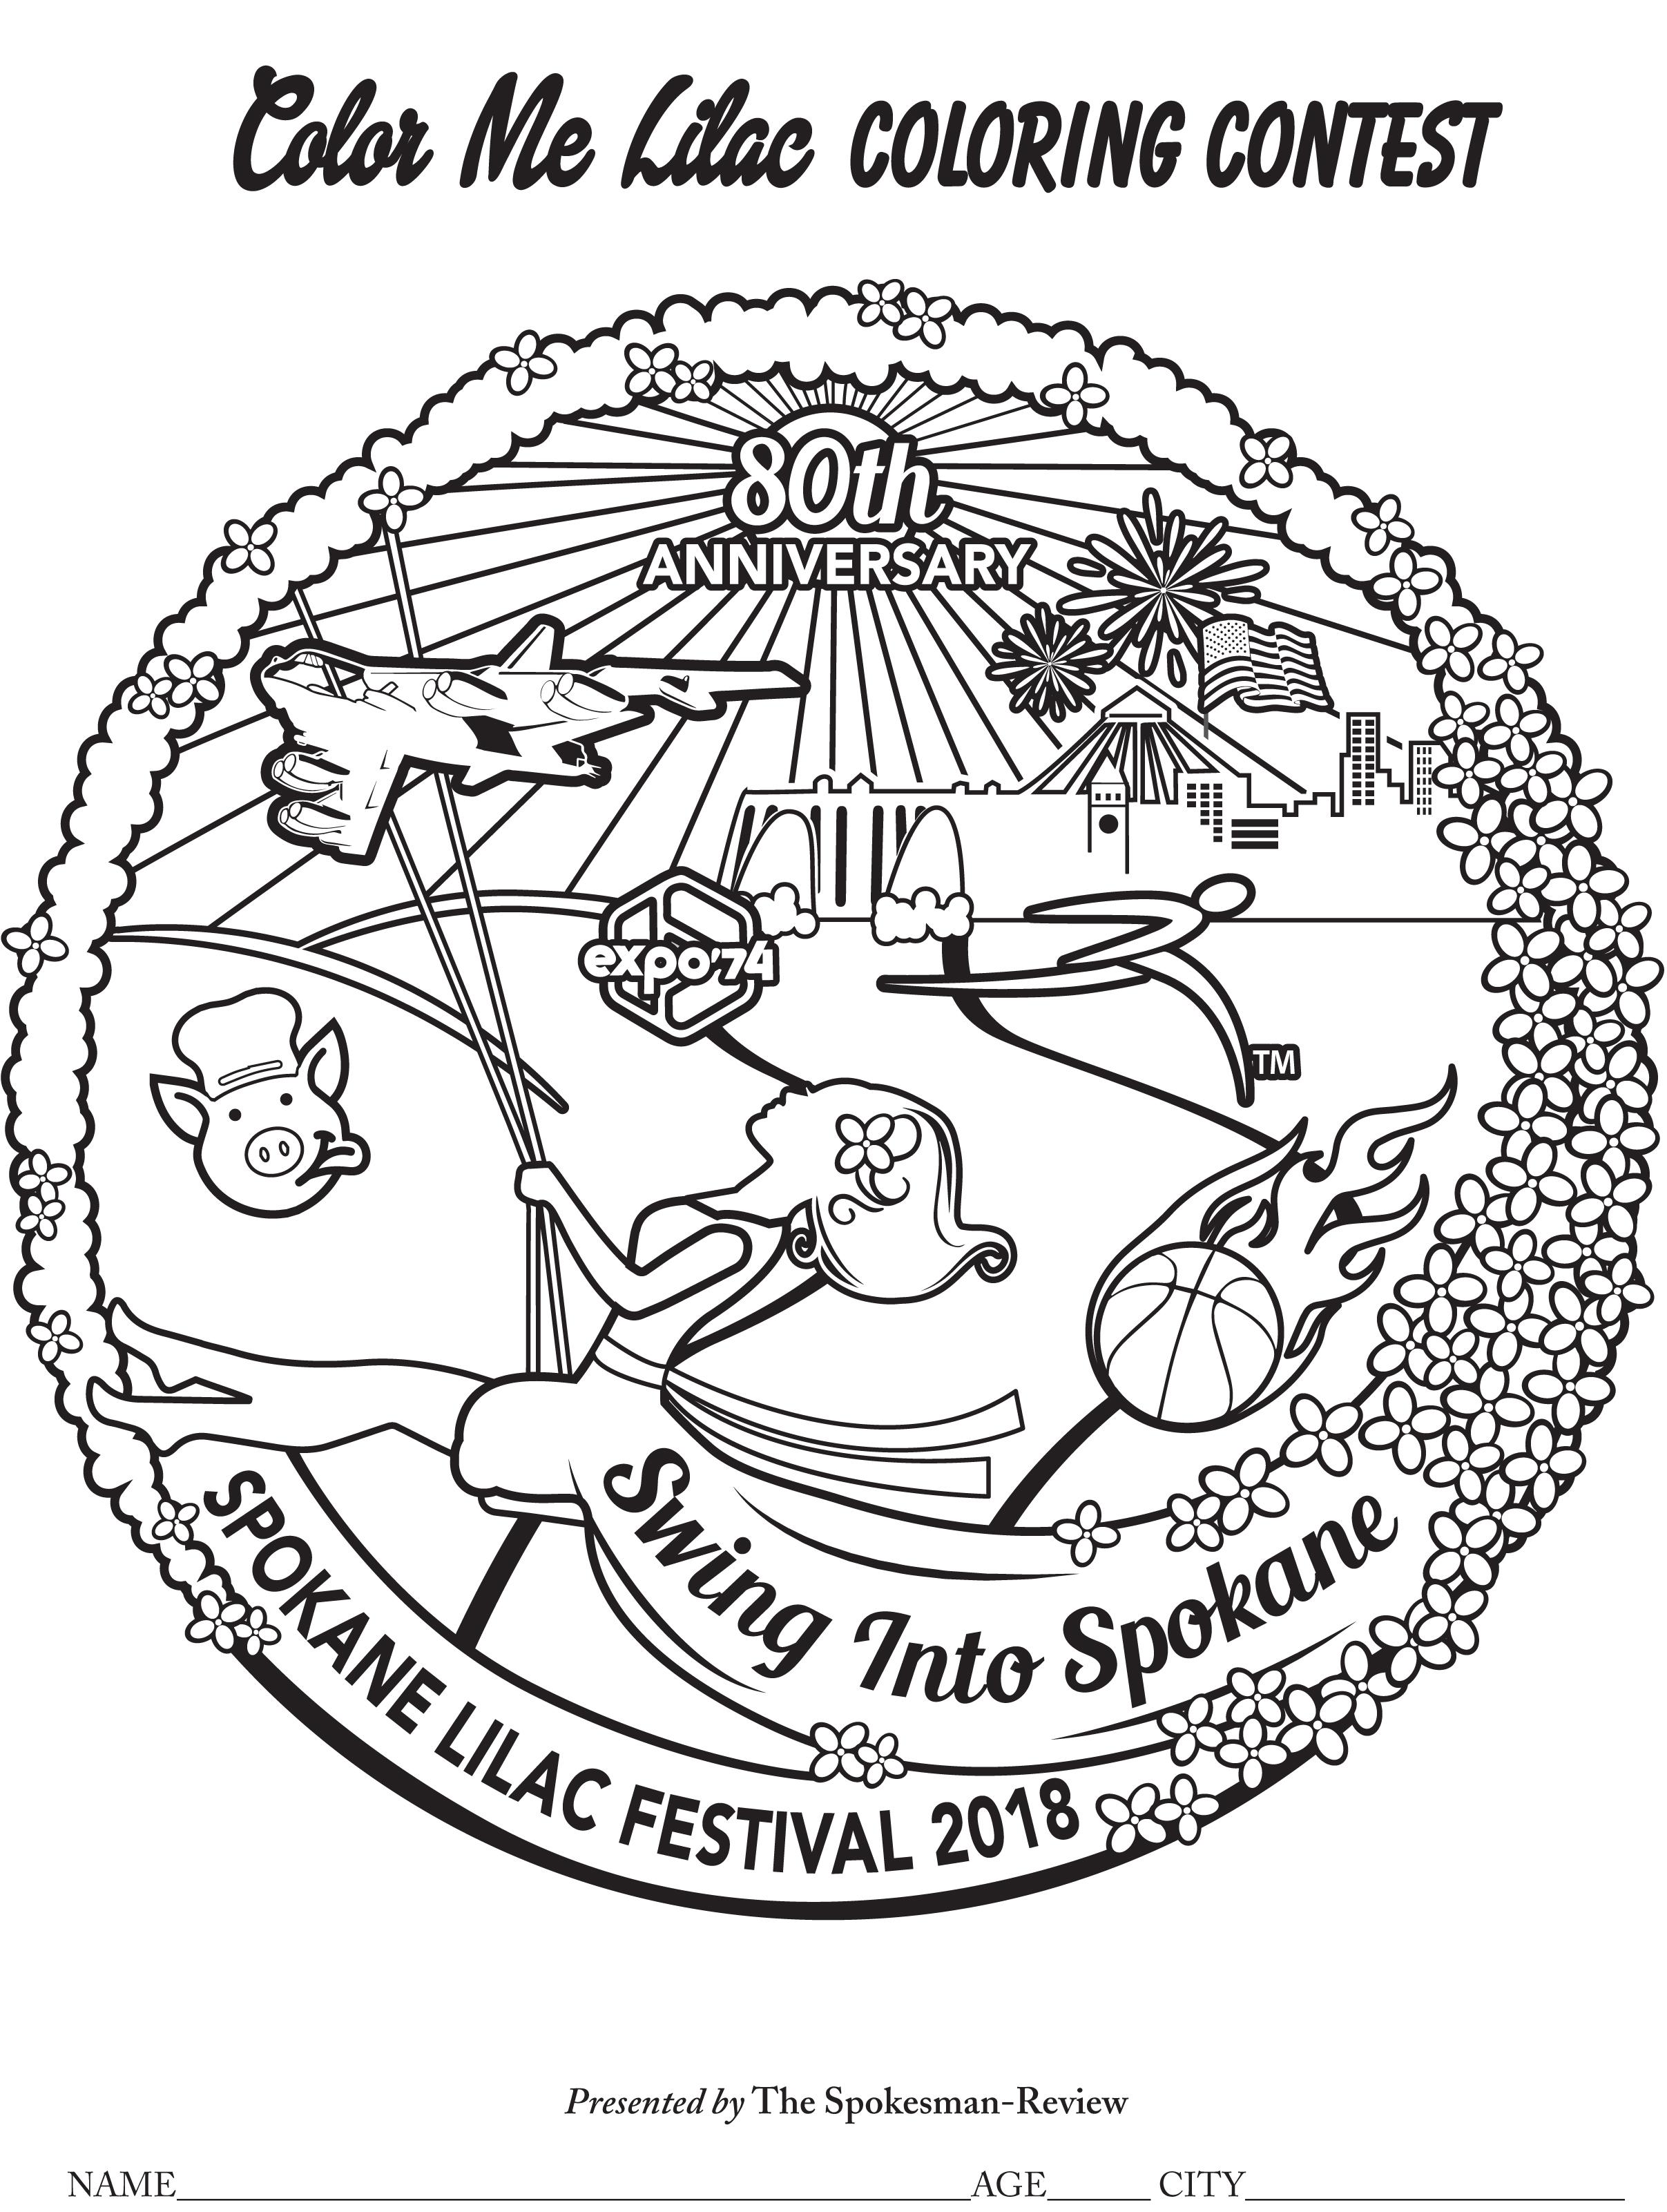 lilac festival coloring contest